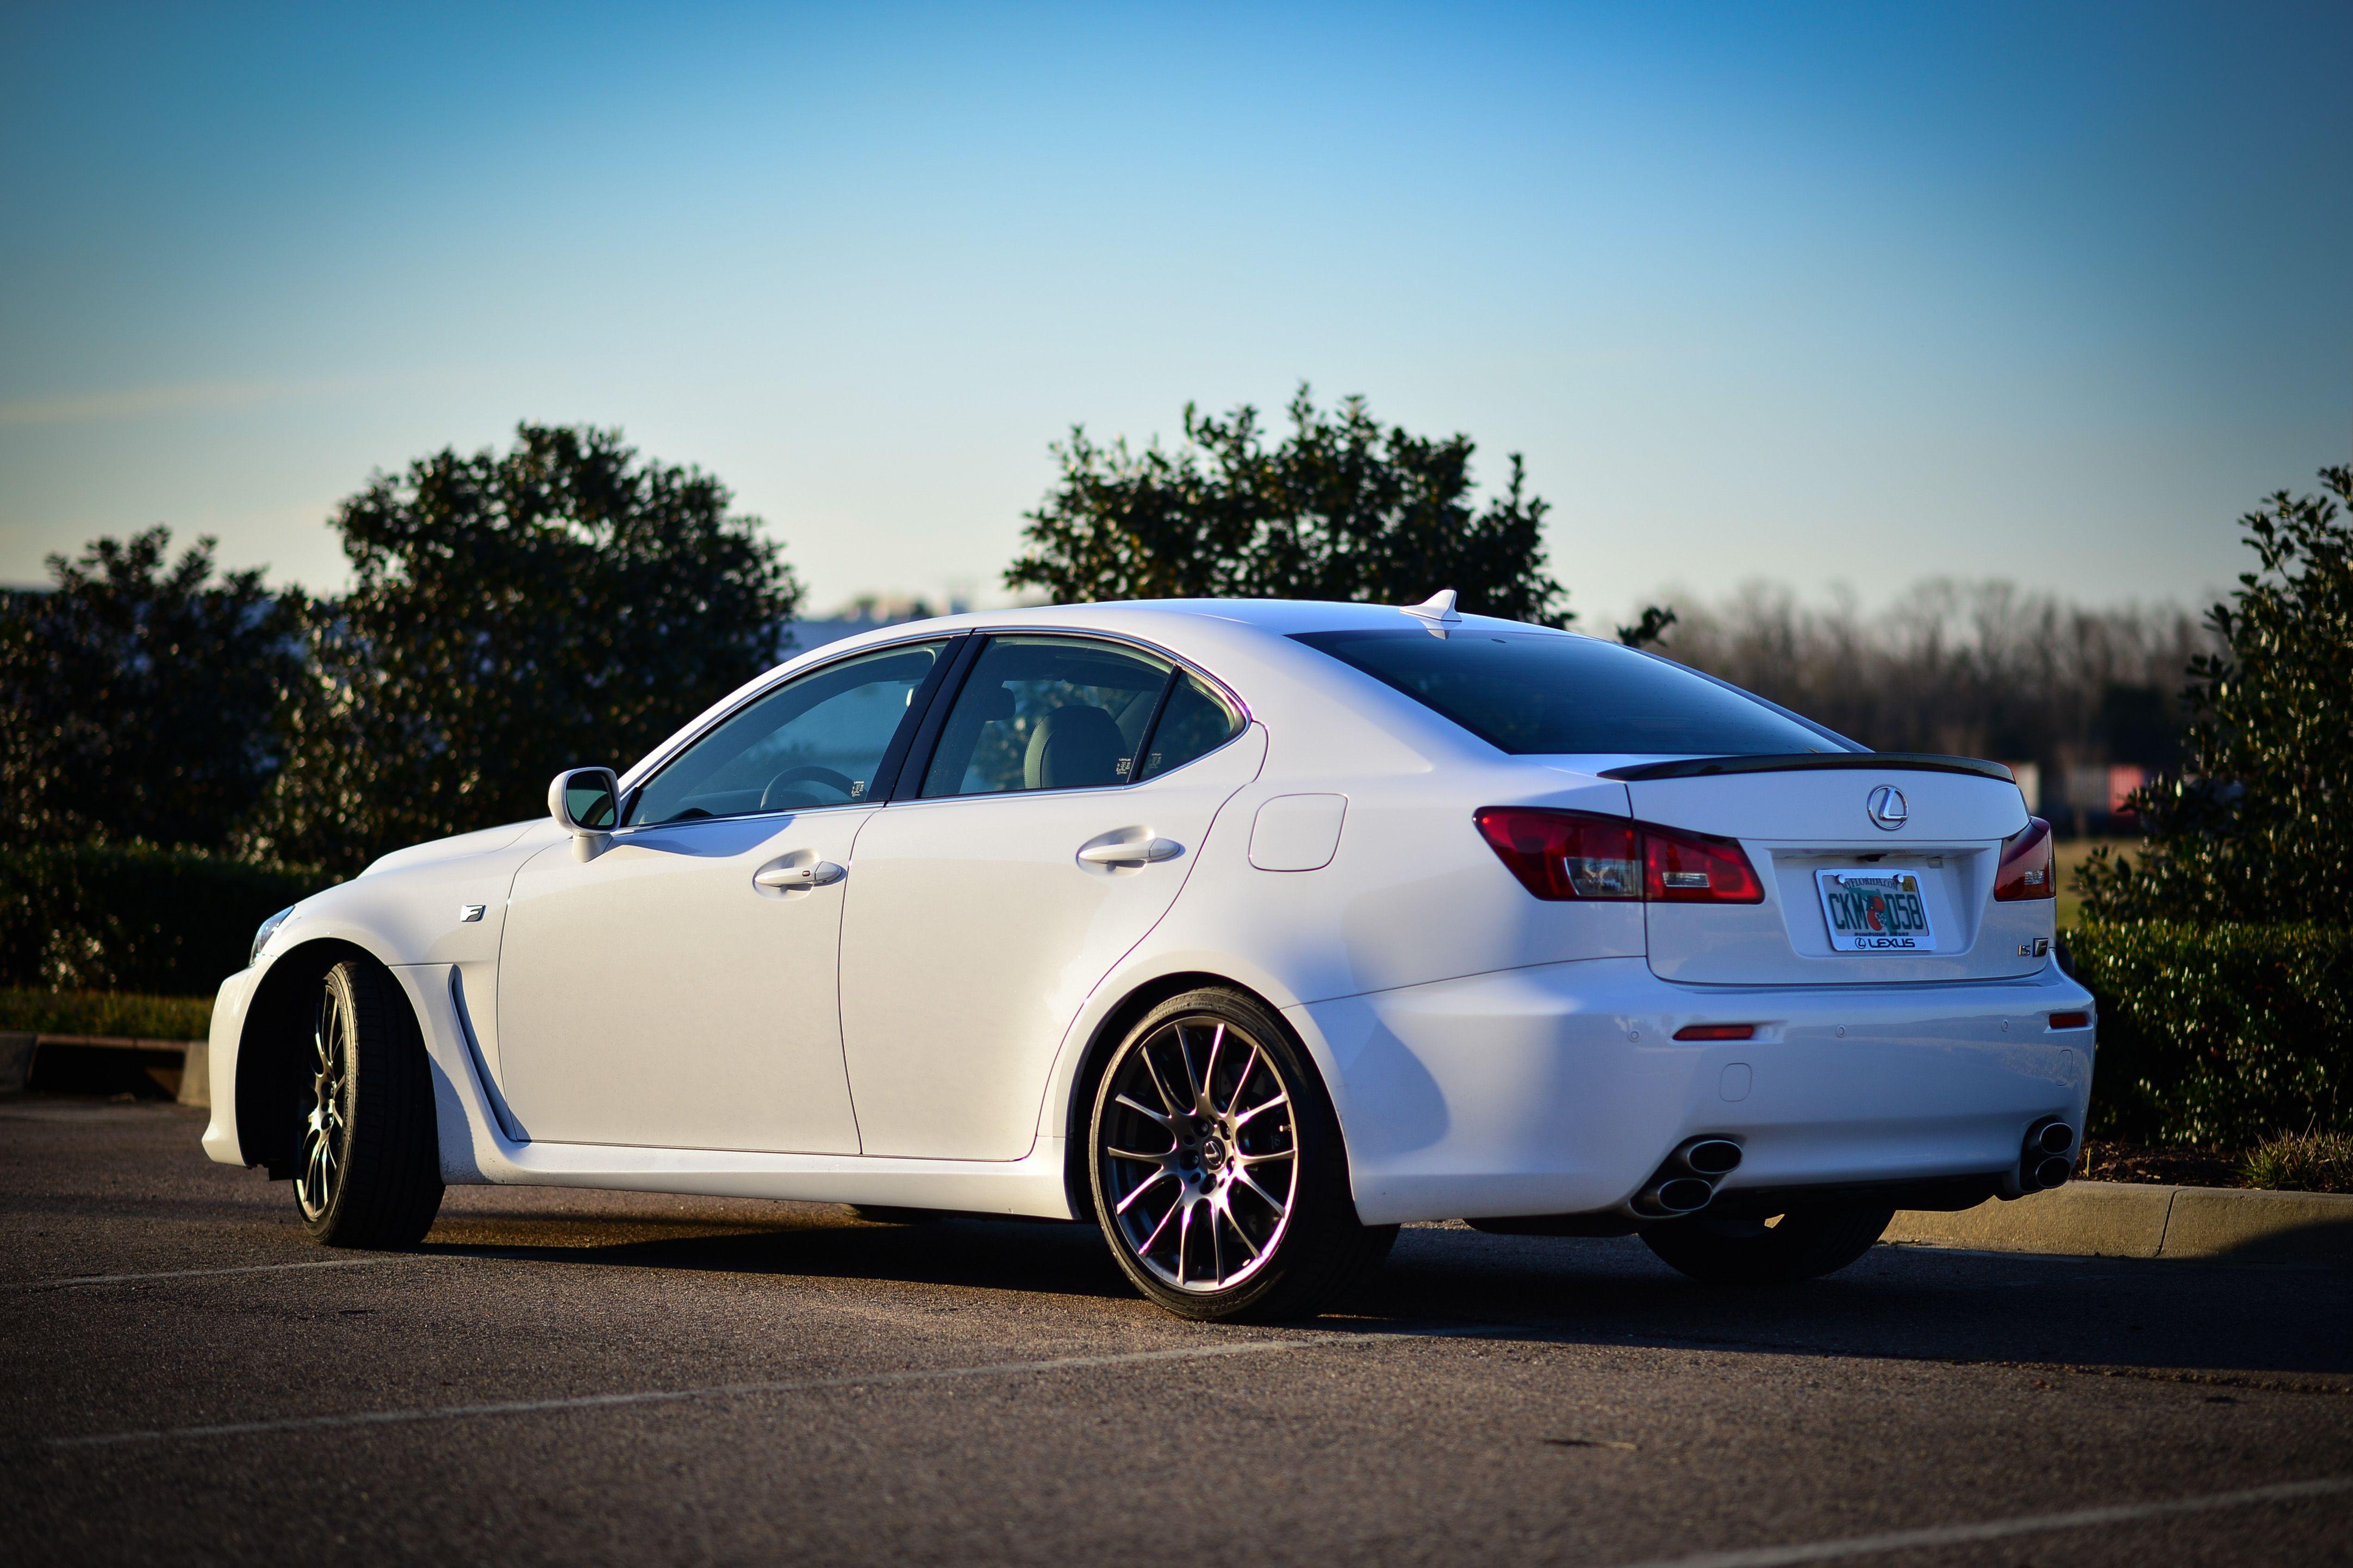 Idea by dainius jev on Stuff to buy White lexus, Lexus